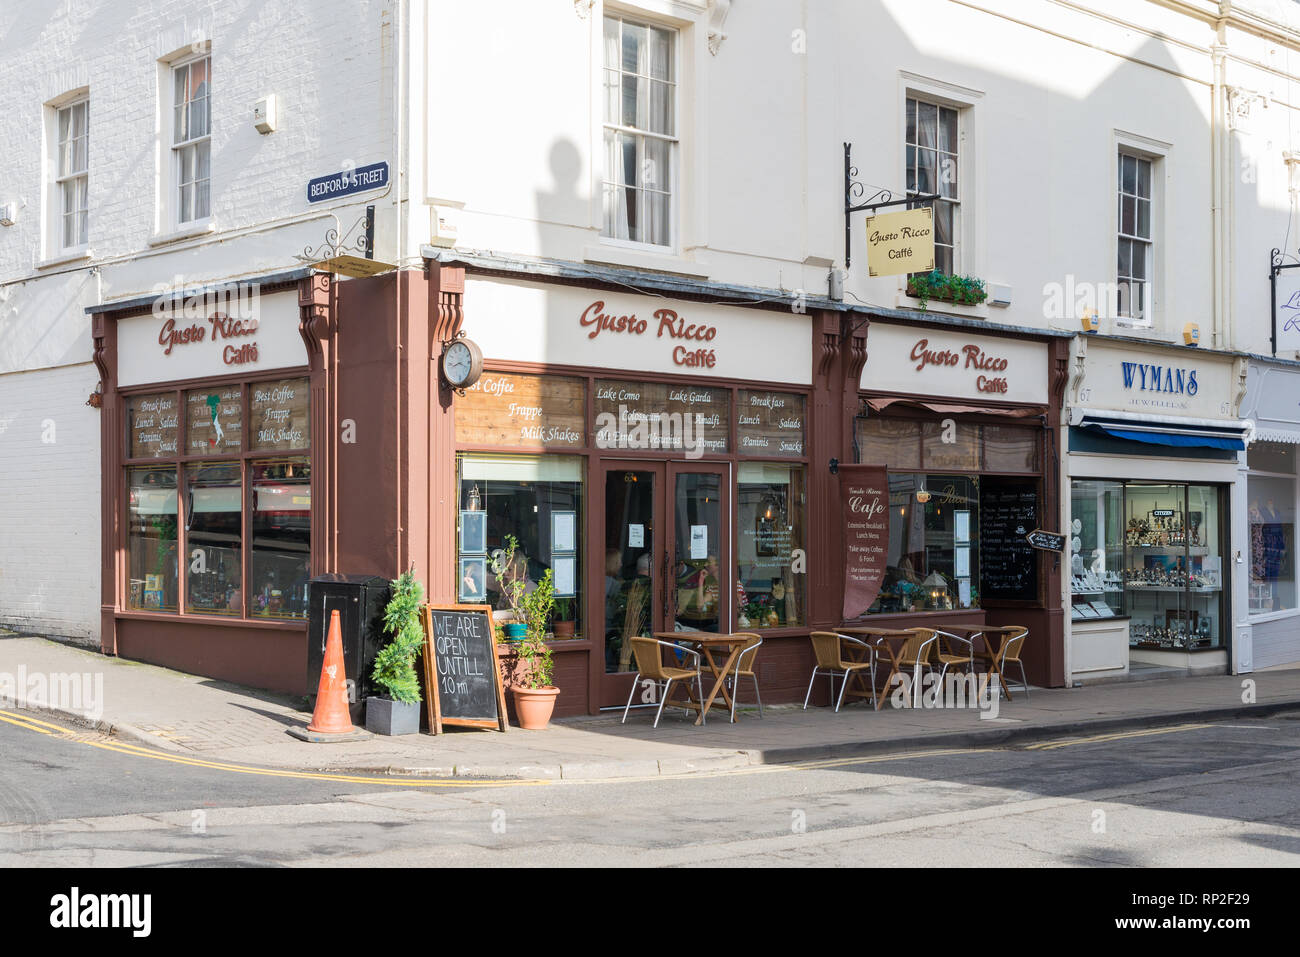 Gusto Rico Italian cafe in Regent Street, Leamington Spa, Warwickshire - Stock Image